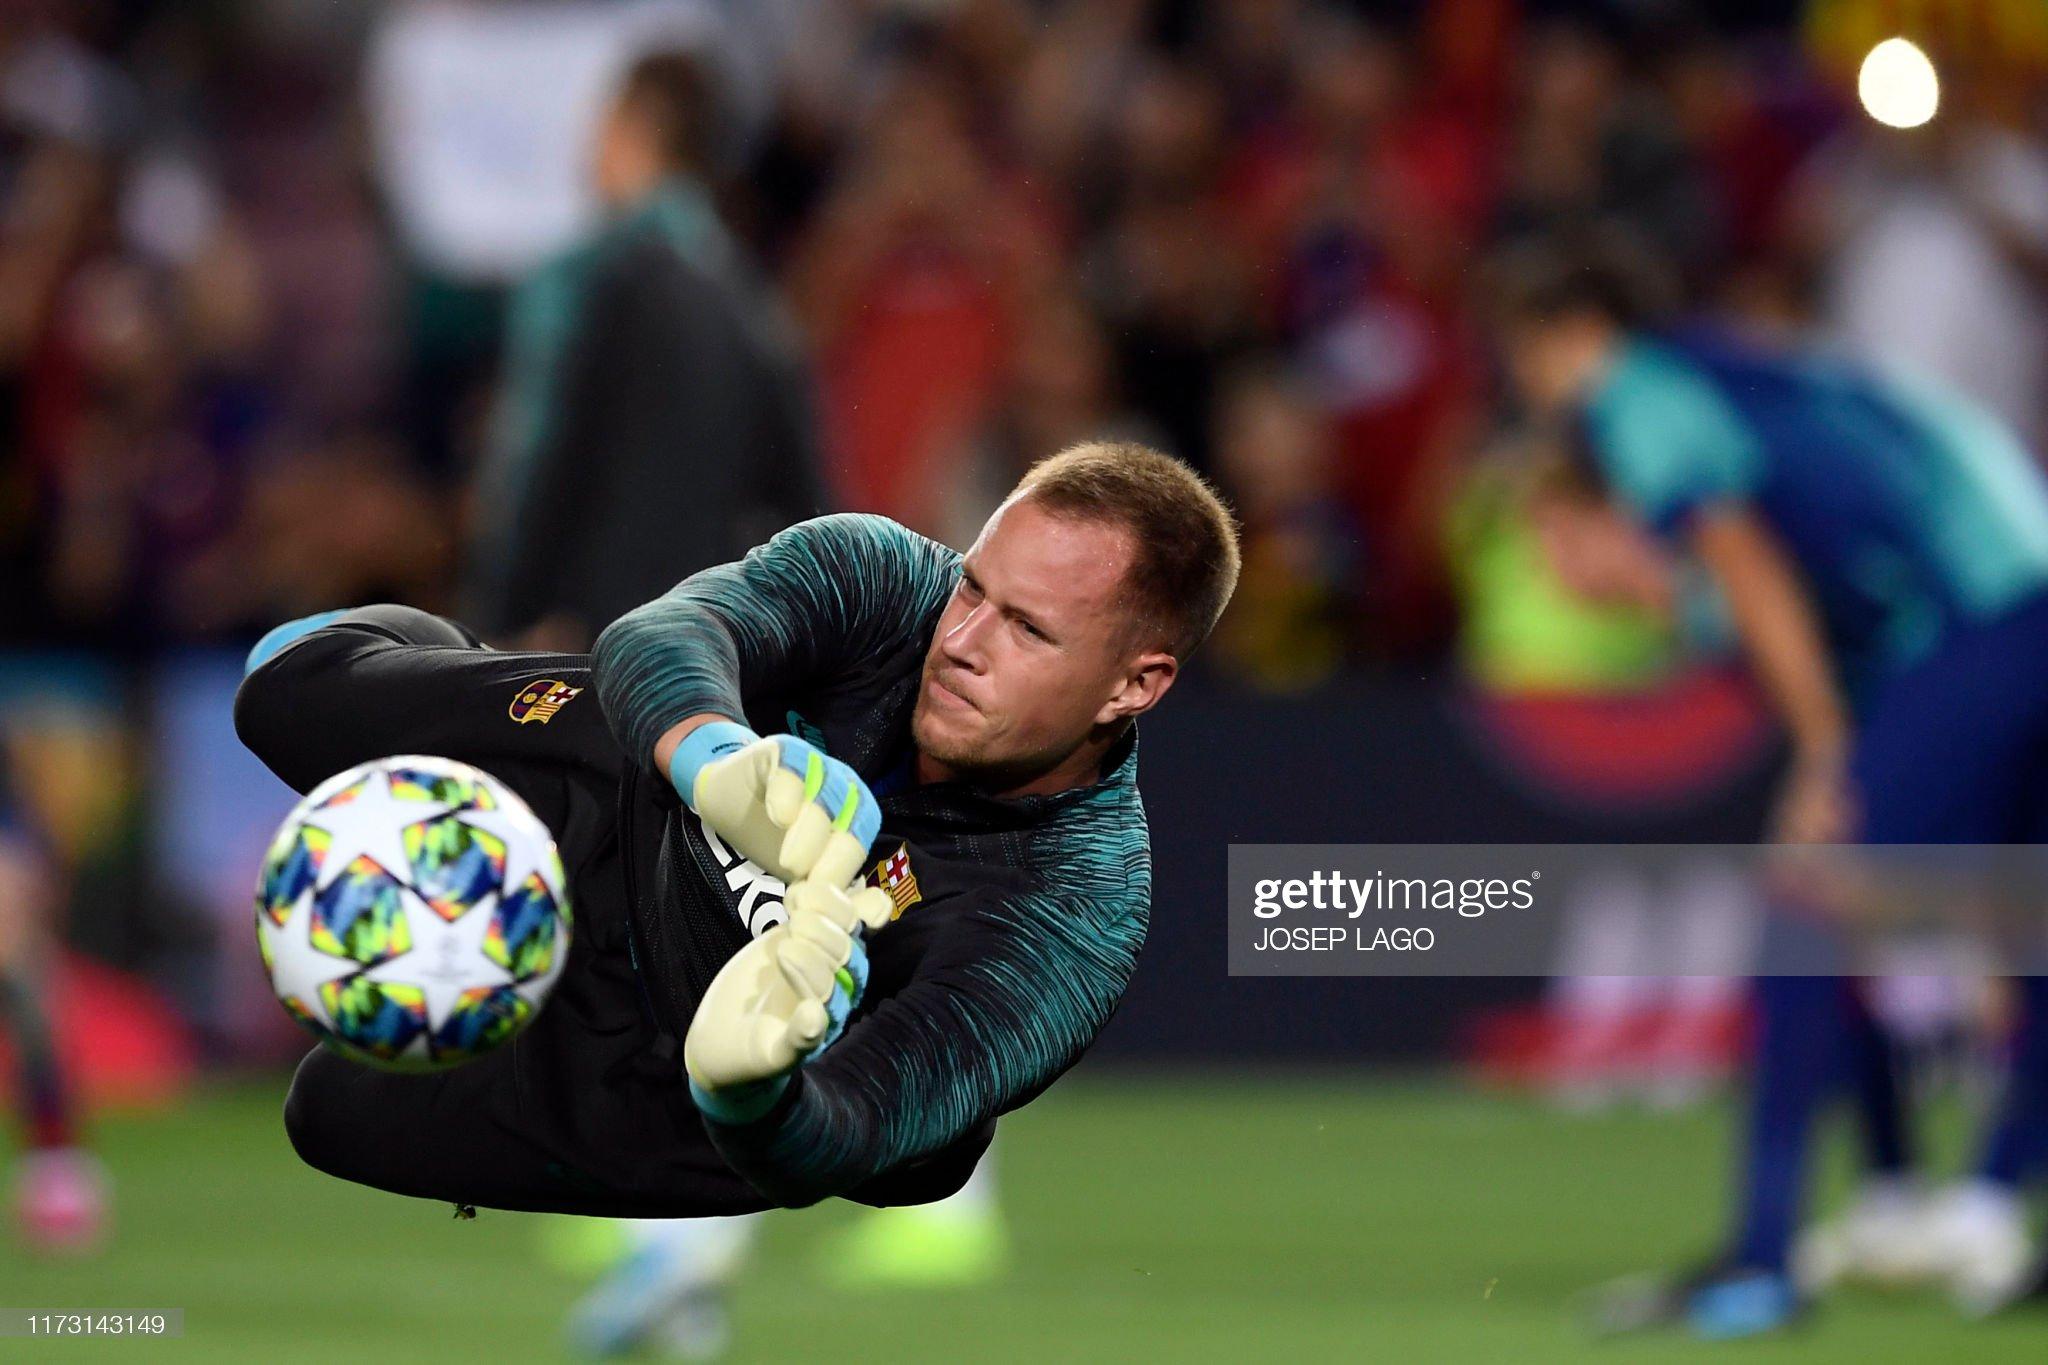 صور مباراة : برشلونة - إنتر 2-1 ( 02-10-2019 )  Barcelonas-german-goalkeeper-marcandre-ter-stegen-warms-up-before-the-picture-id1173143149?s=2048x2048